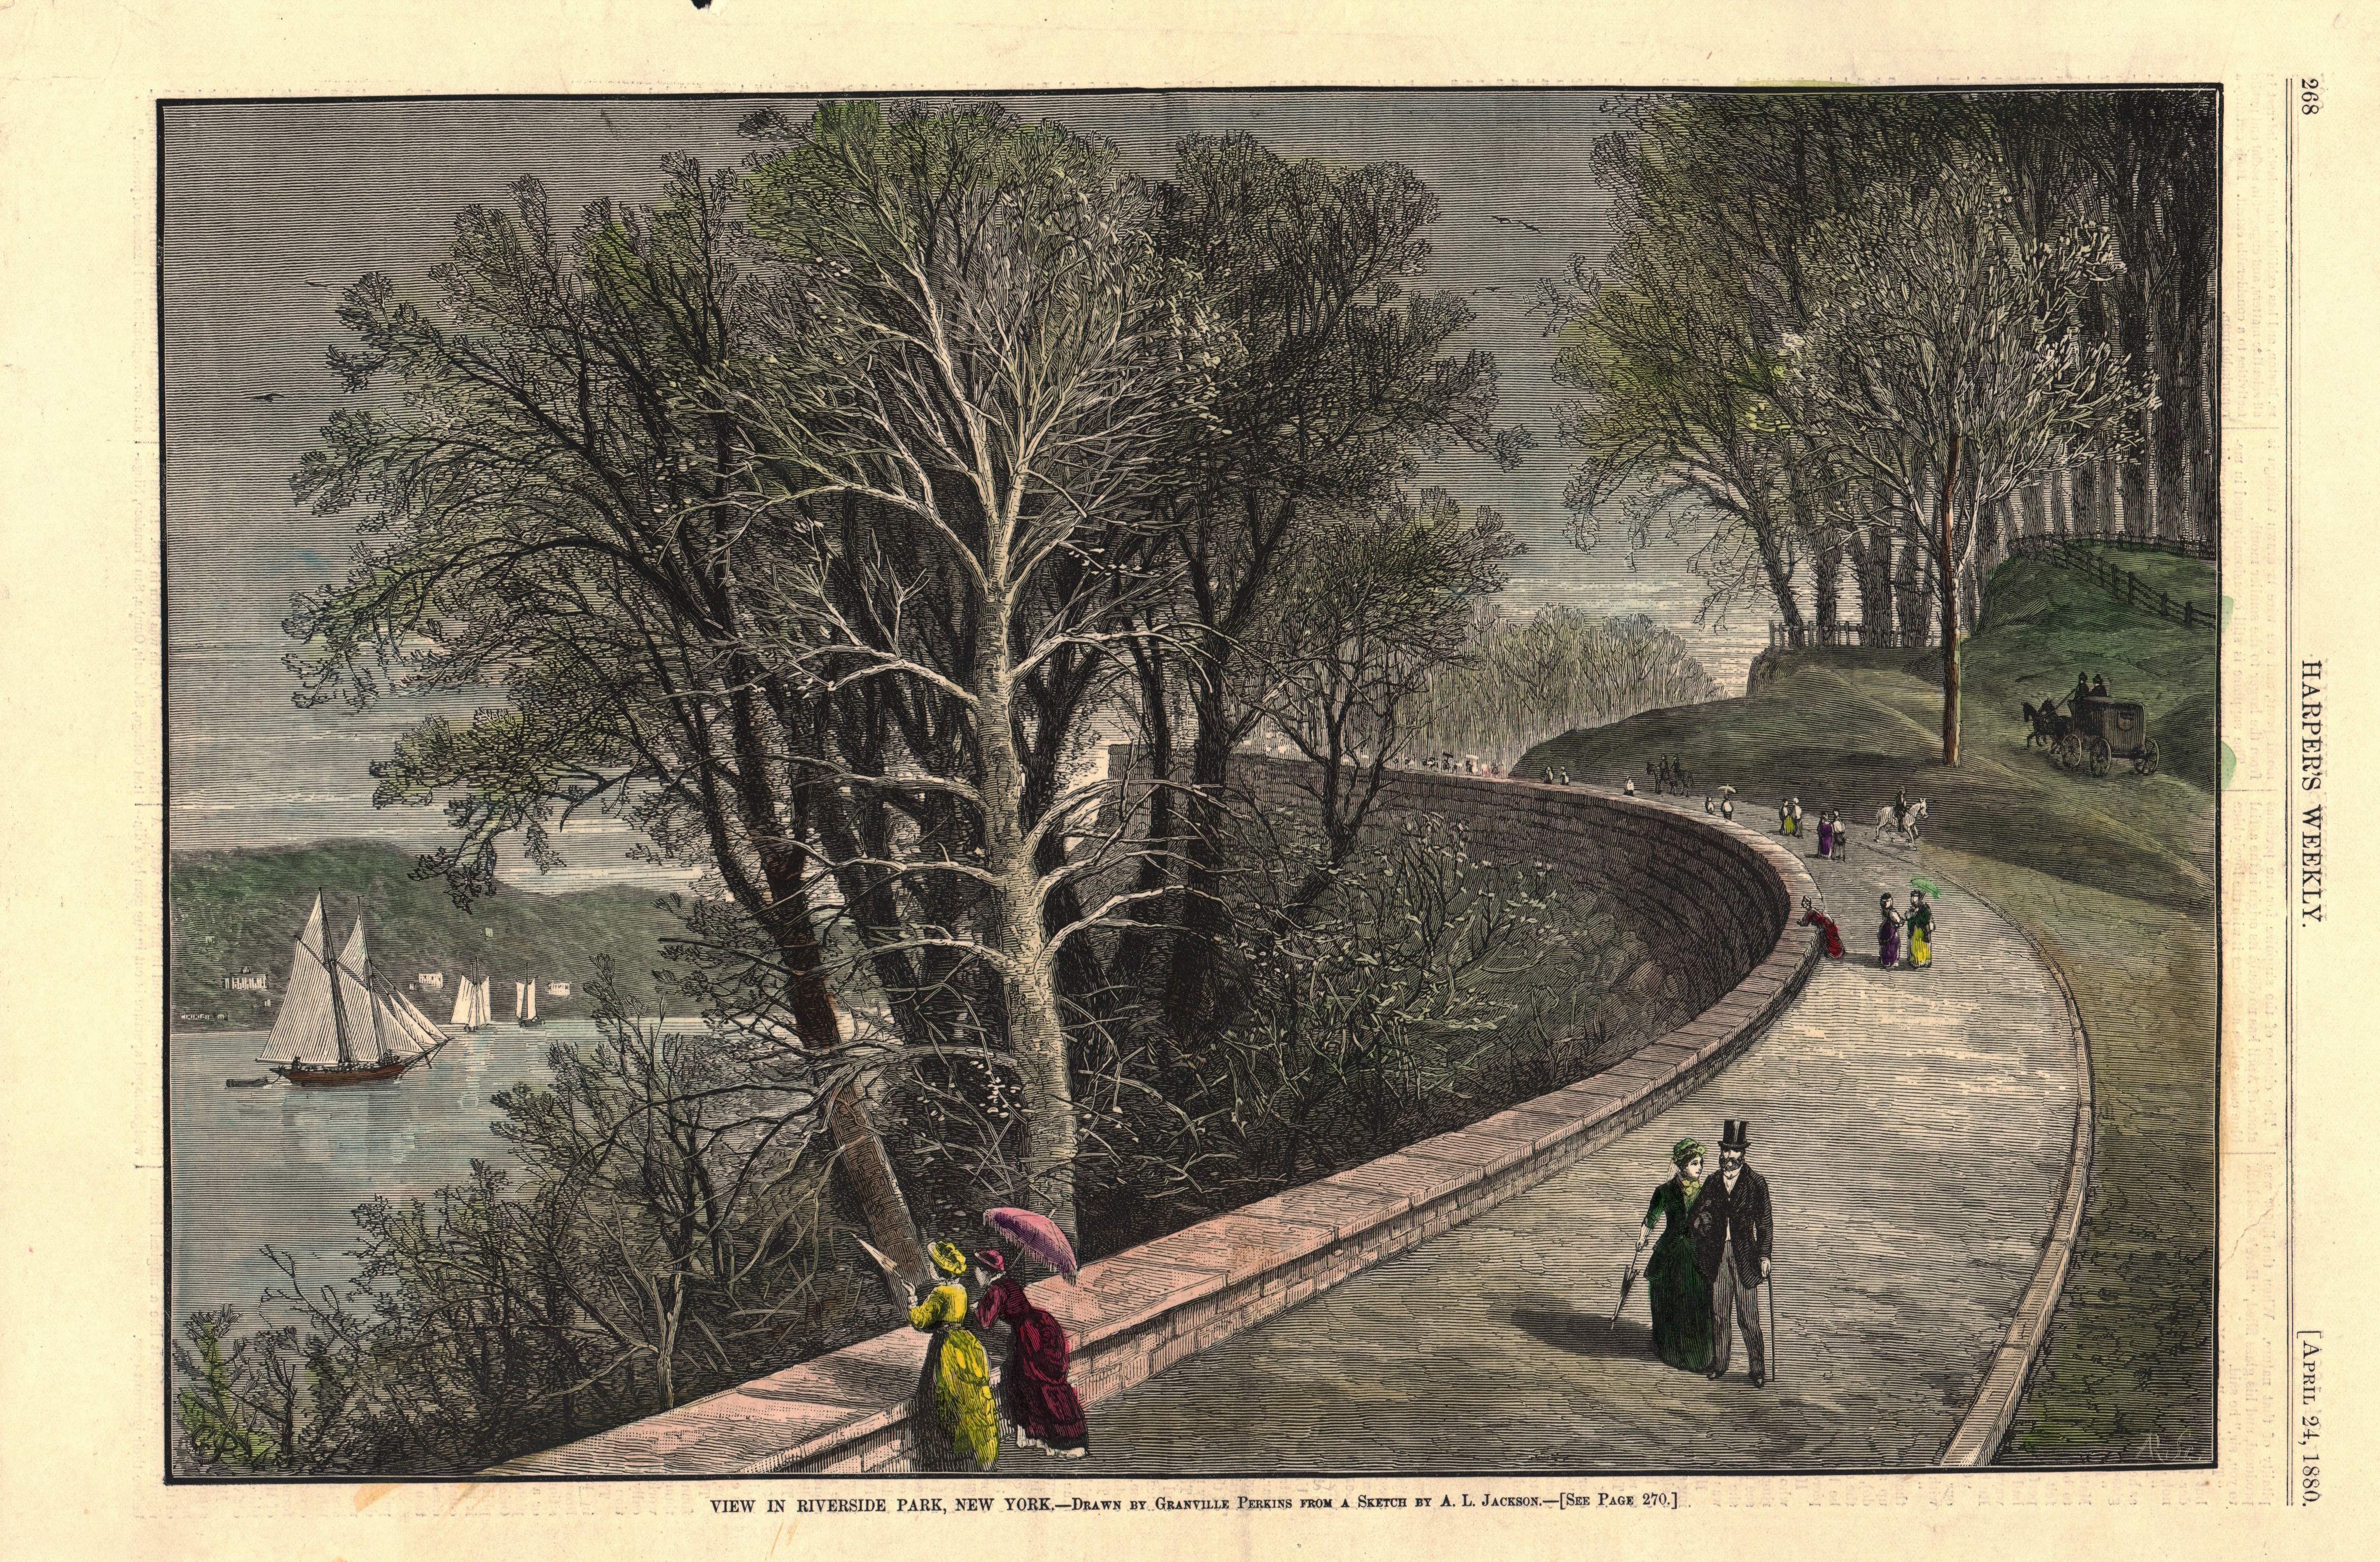 View in Riverside Park, NY